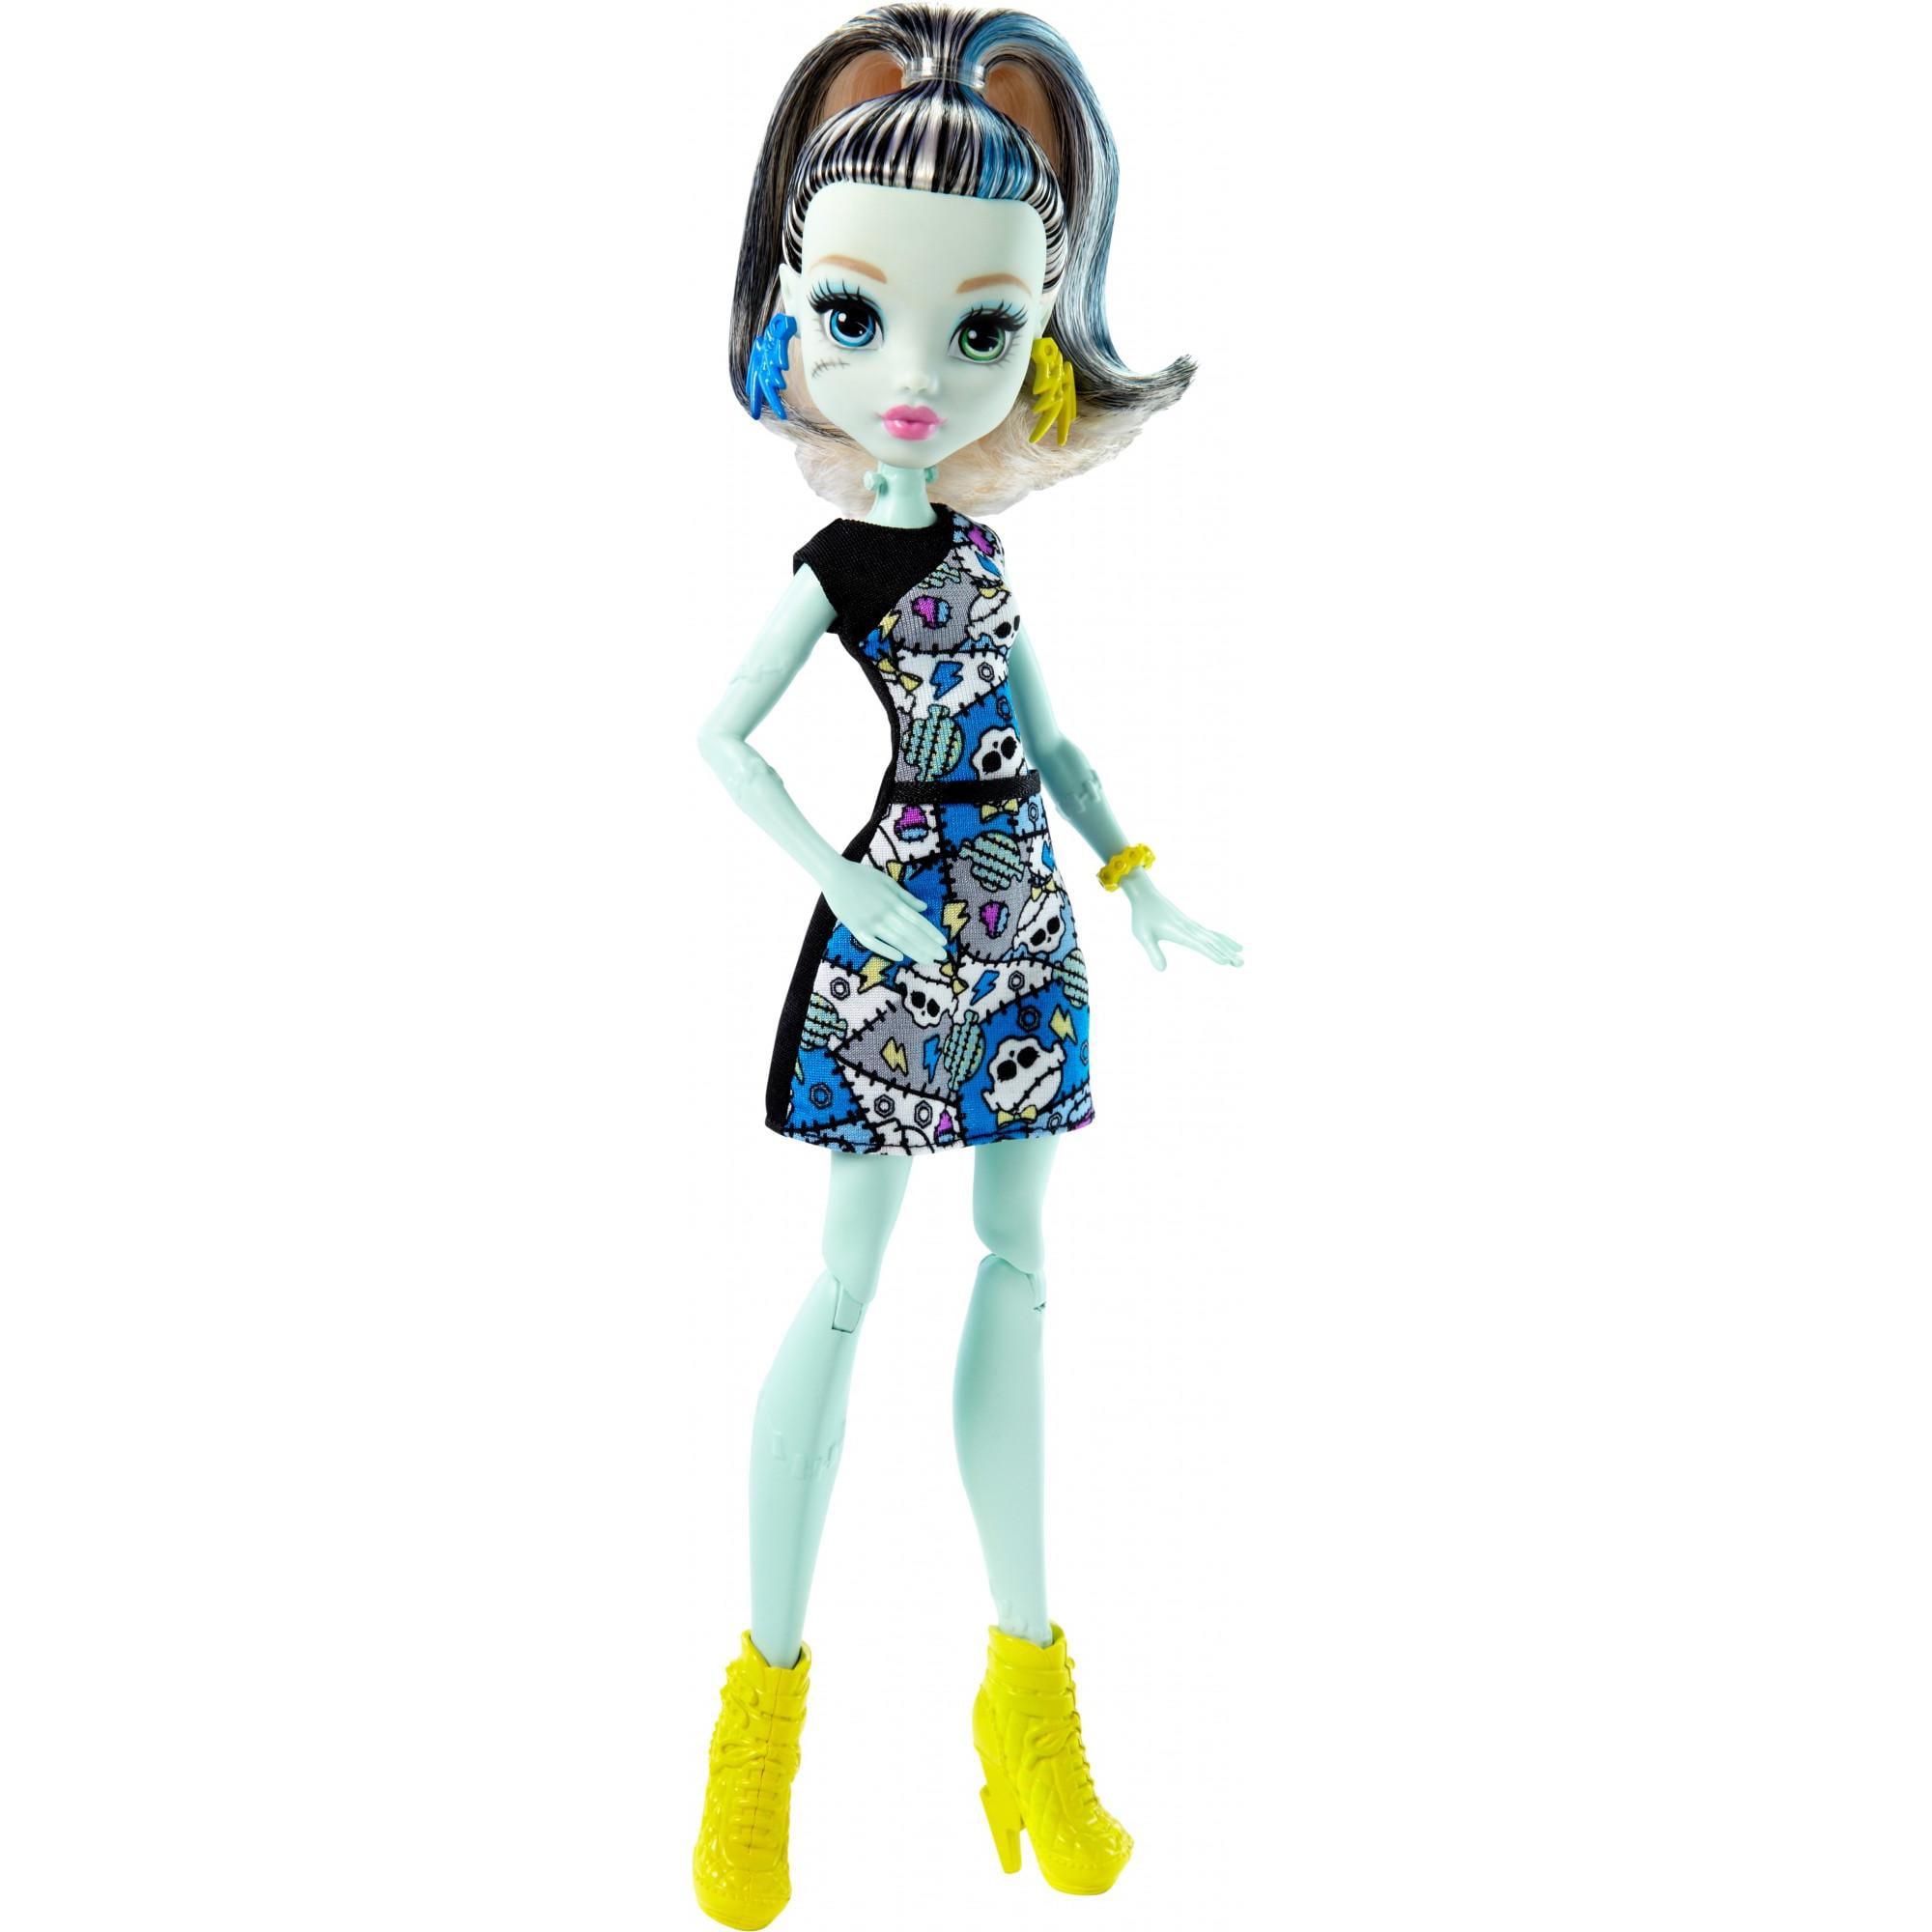 Monster High Frankie Stein Doll by MATTEL INC.